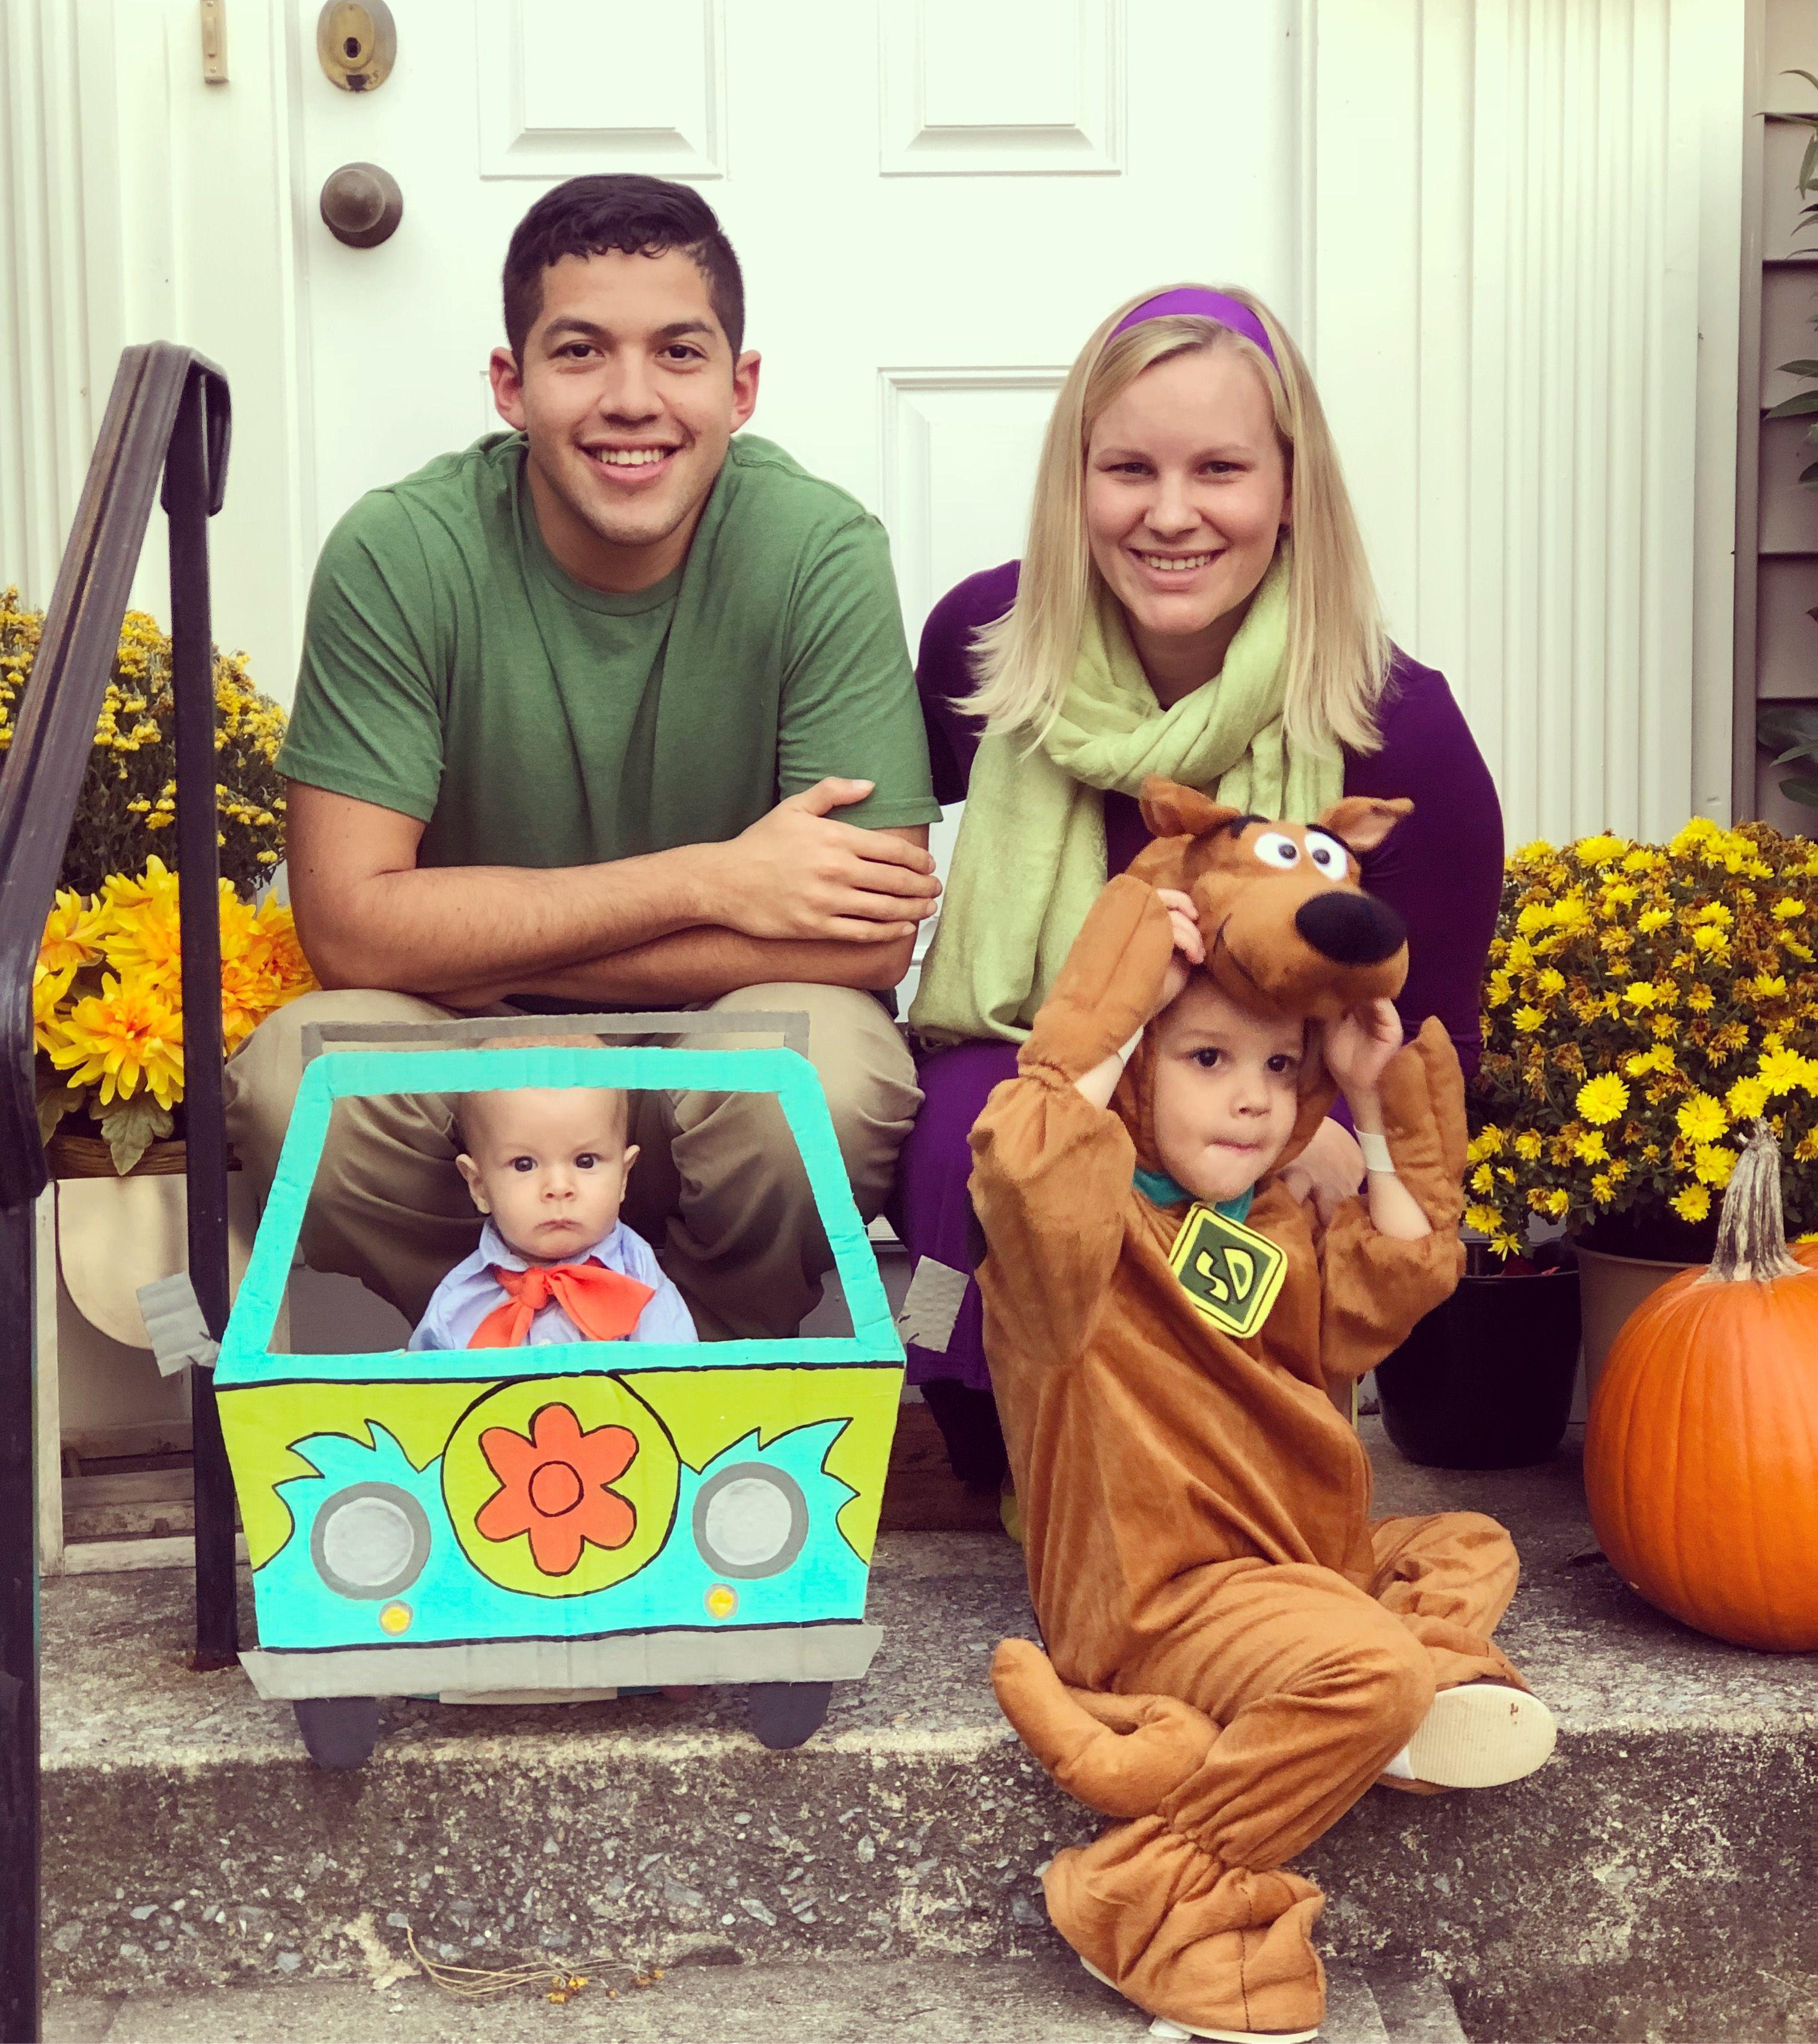 Scooby Doo Family Costume | Family costumes, Family ...